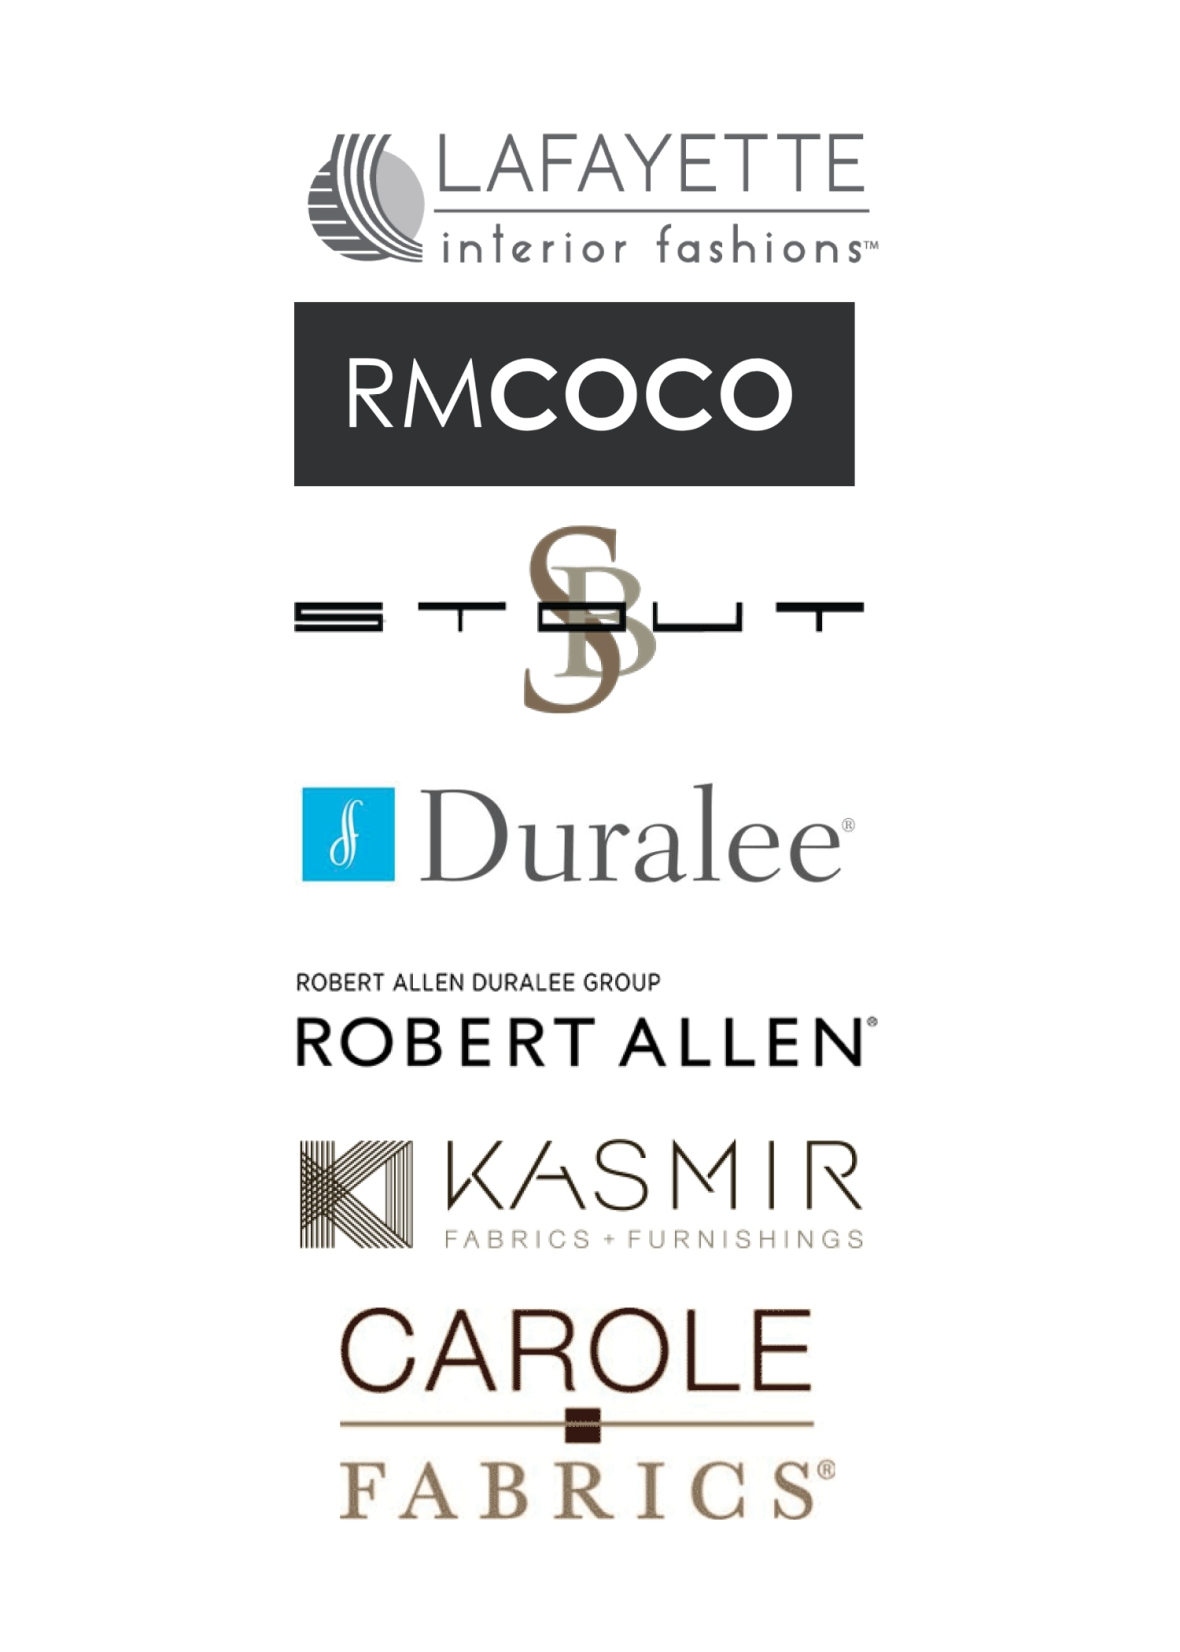 Window Treatment Vendor Logos